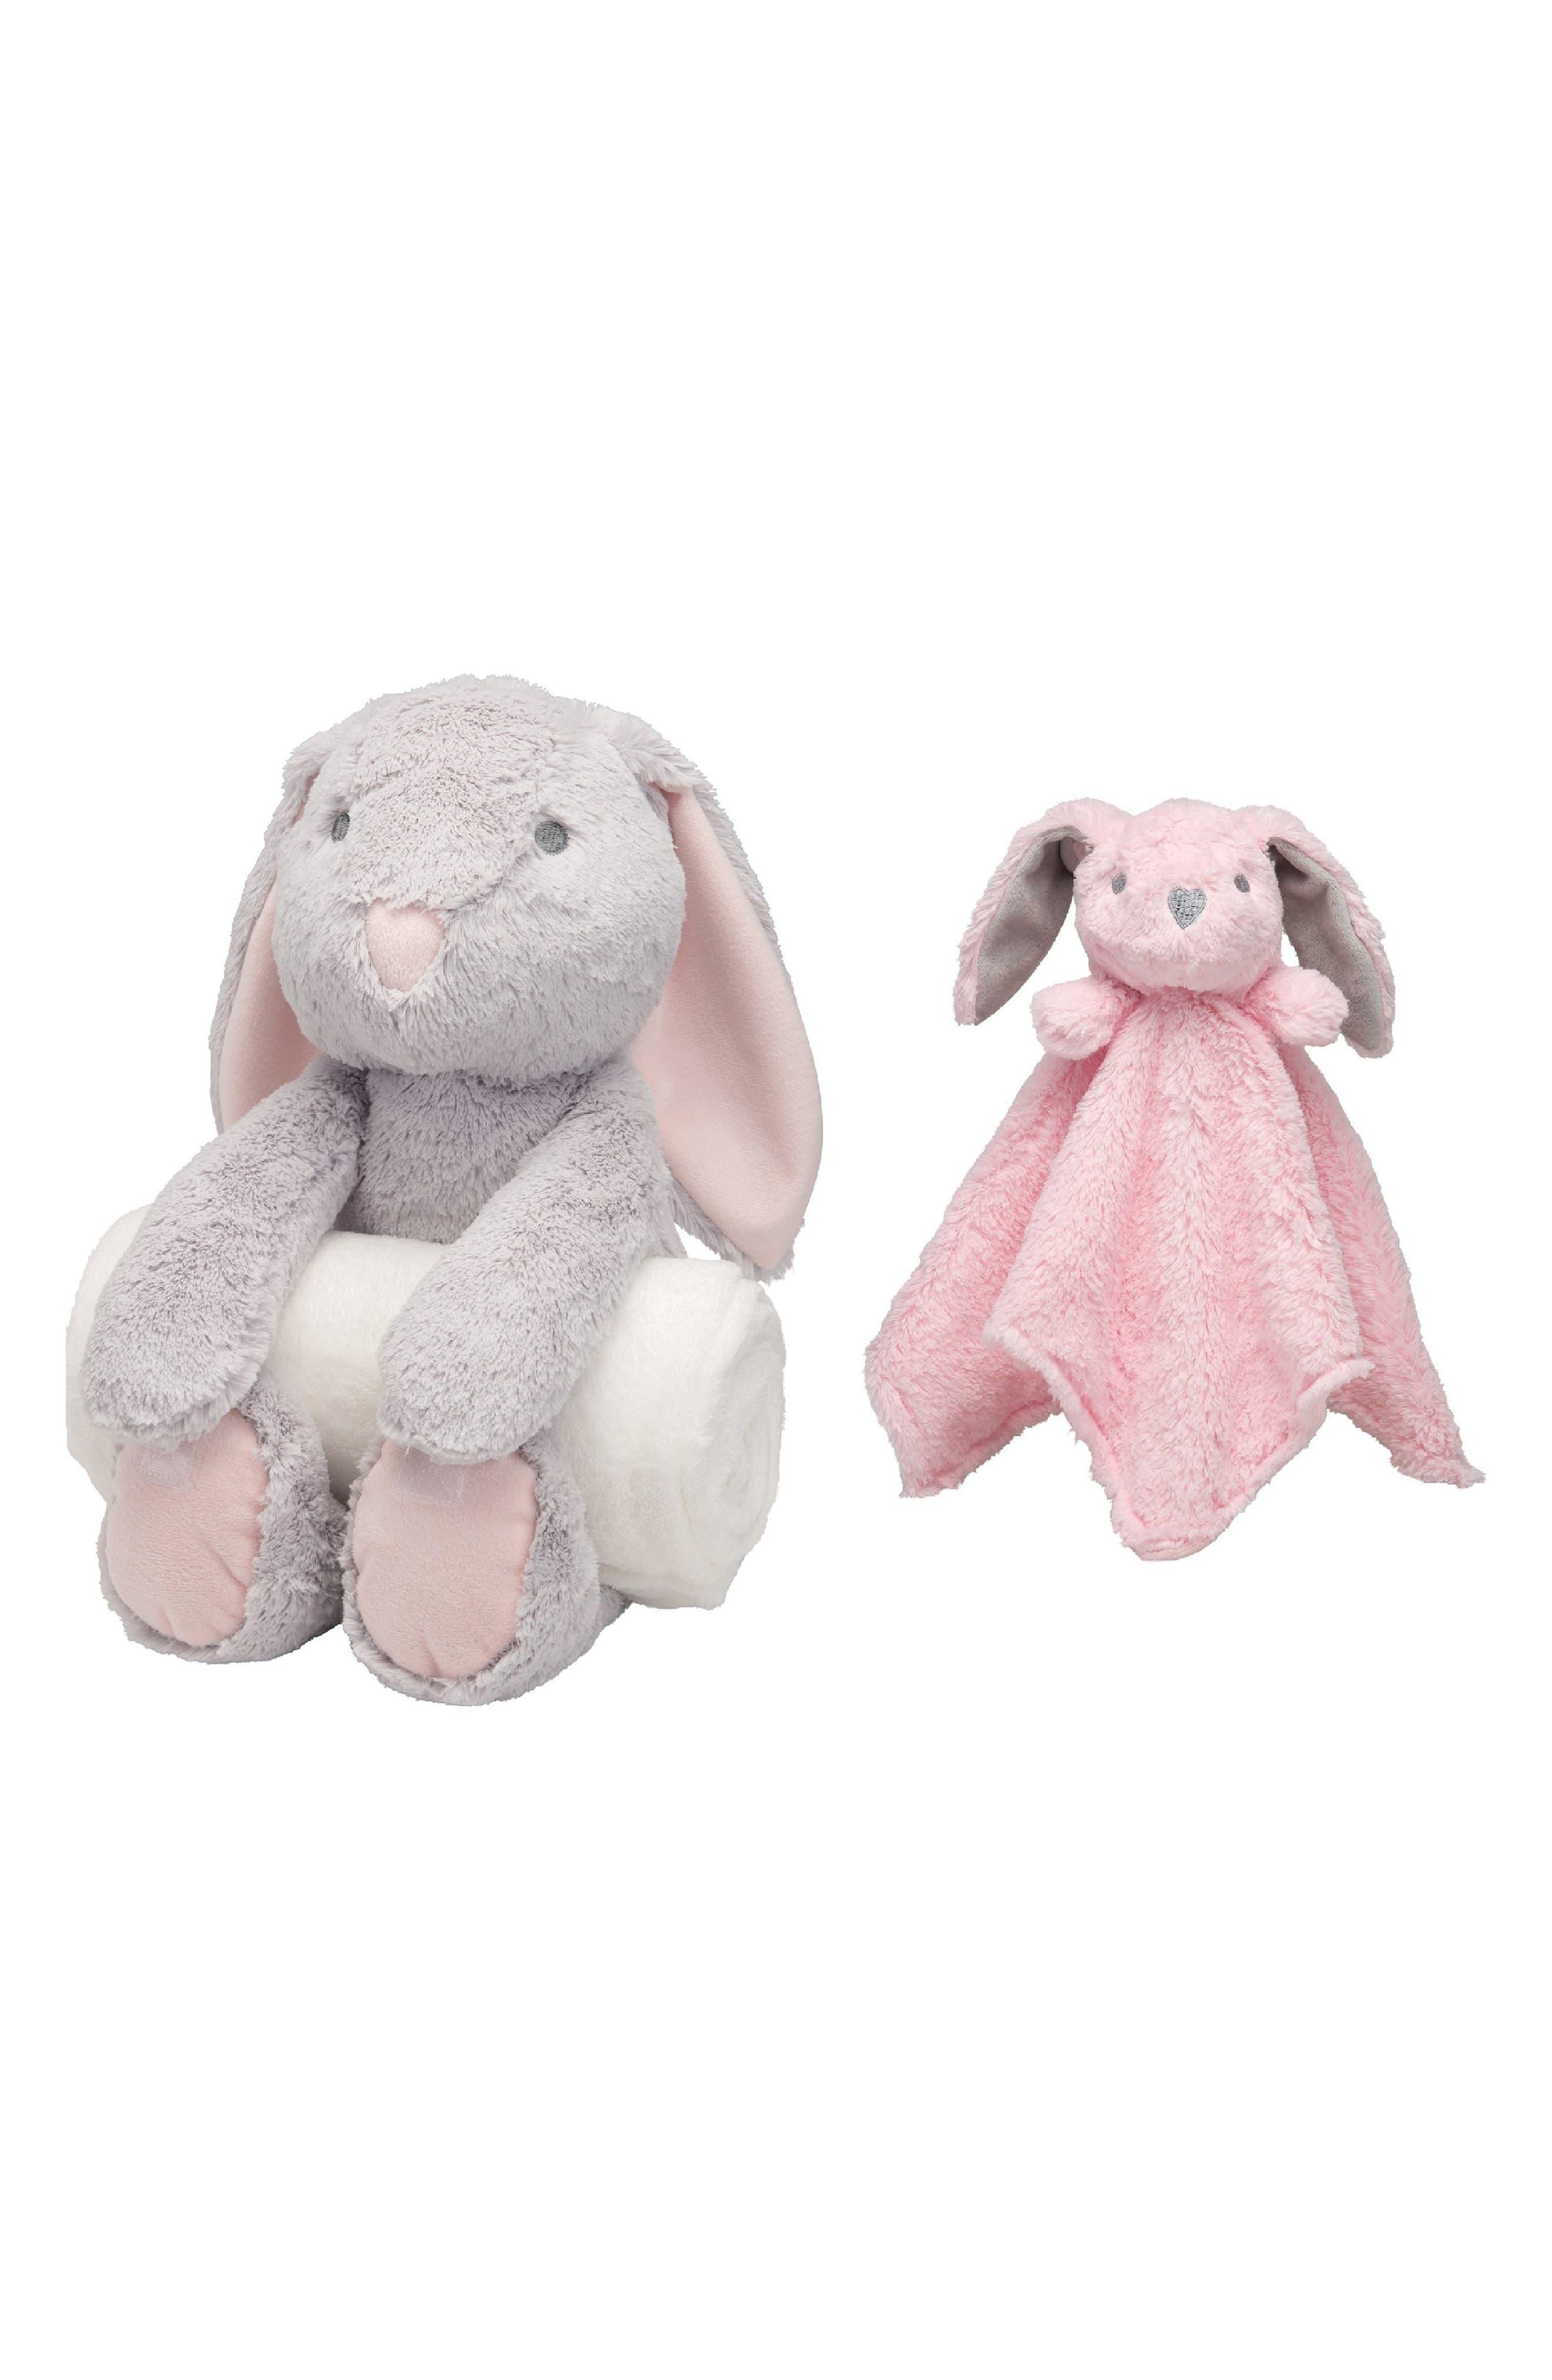 ELEGANT BABY Bunny Bedtime Huggie Stuffed Animal, Blanket & Security Blanket Set, Main, color, PINK